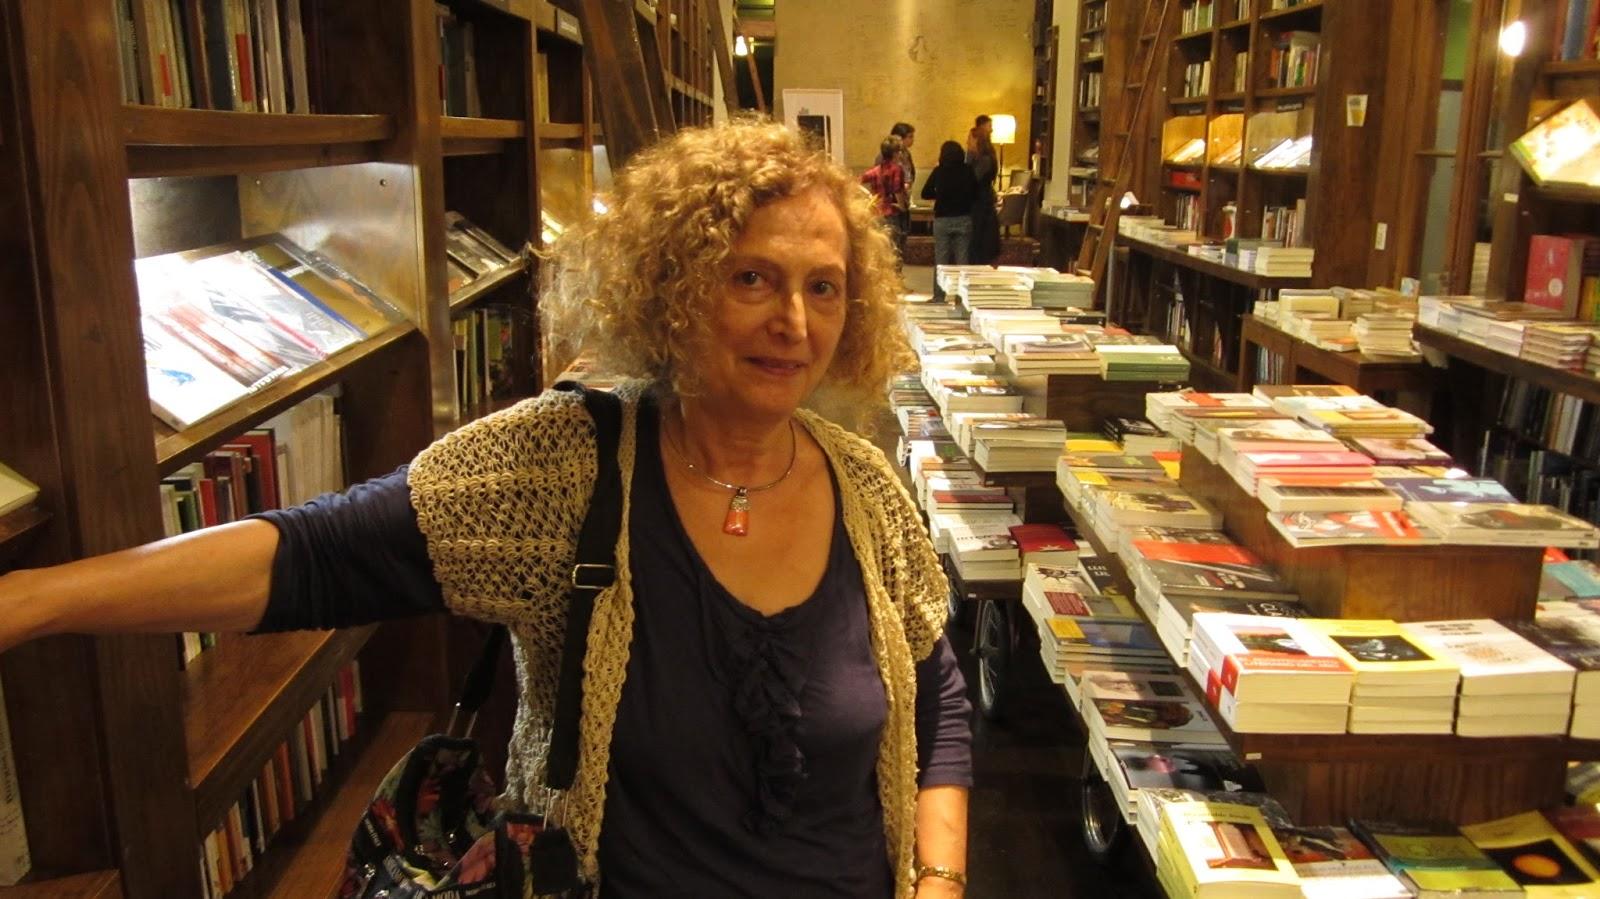 Entretiens Lectures d'ailleurs: María Elena Lorenzin (Argentine)